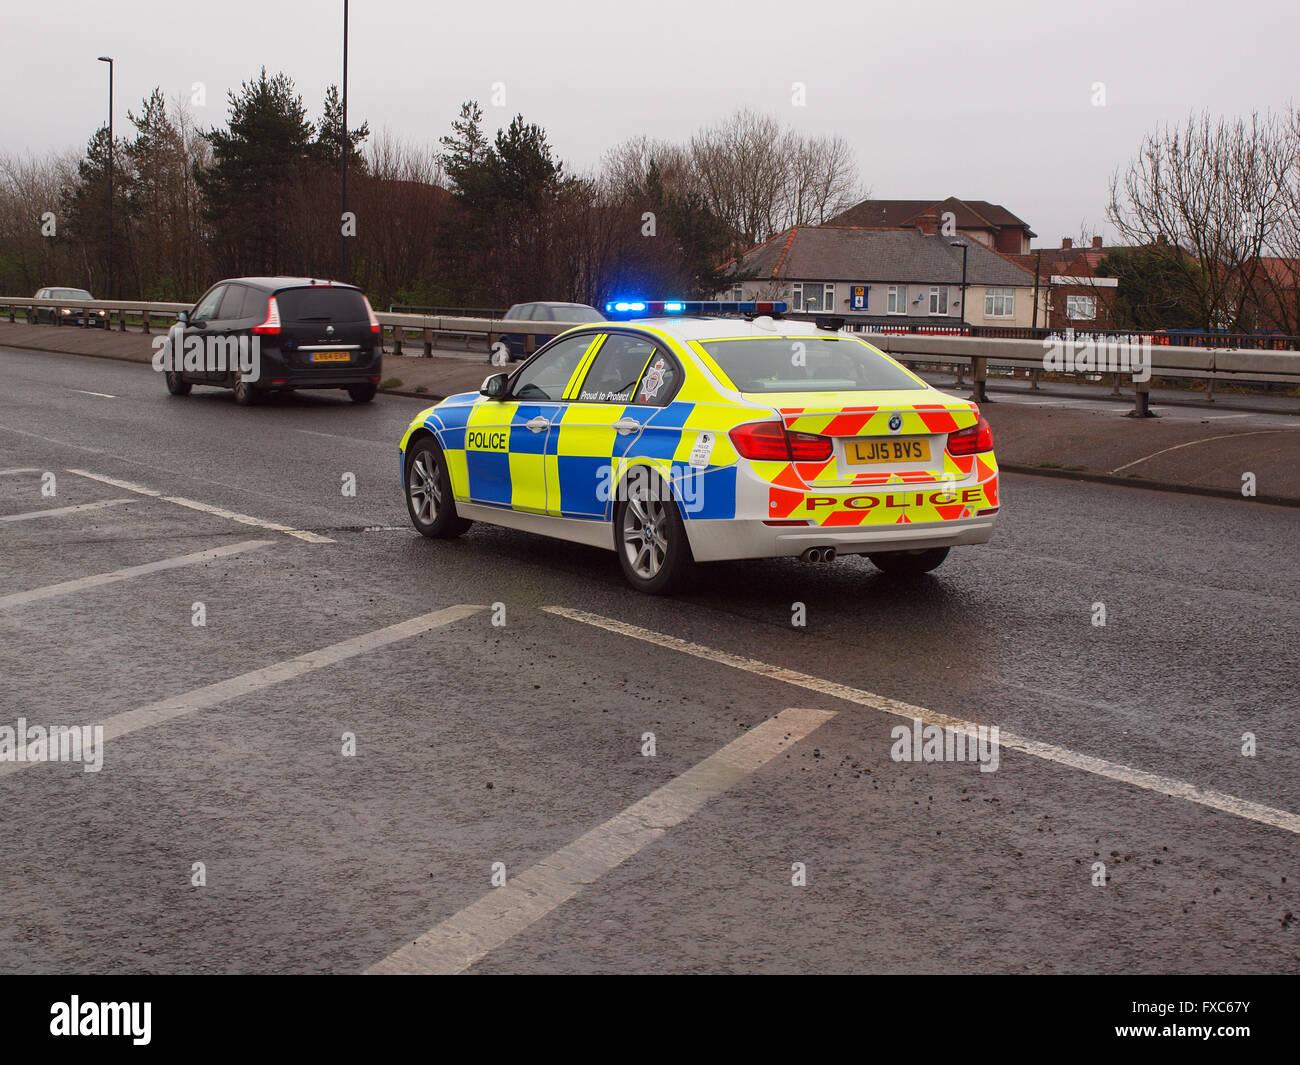 Newcastle upon tyne uk 14th april 2016 stationary northumbria police cars feeding traffic